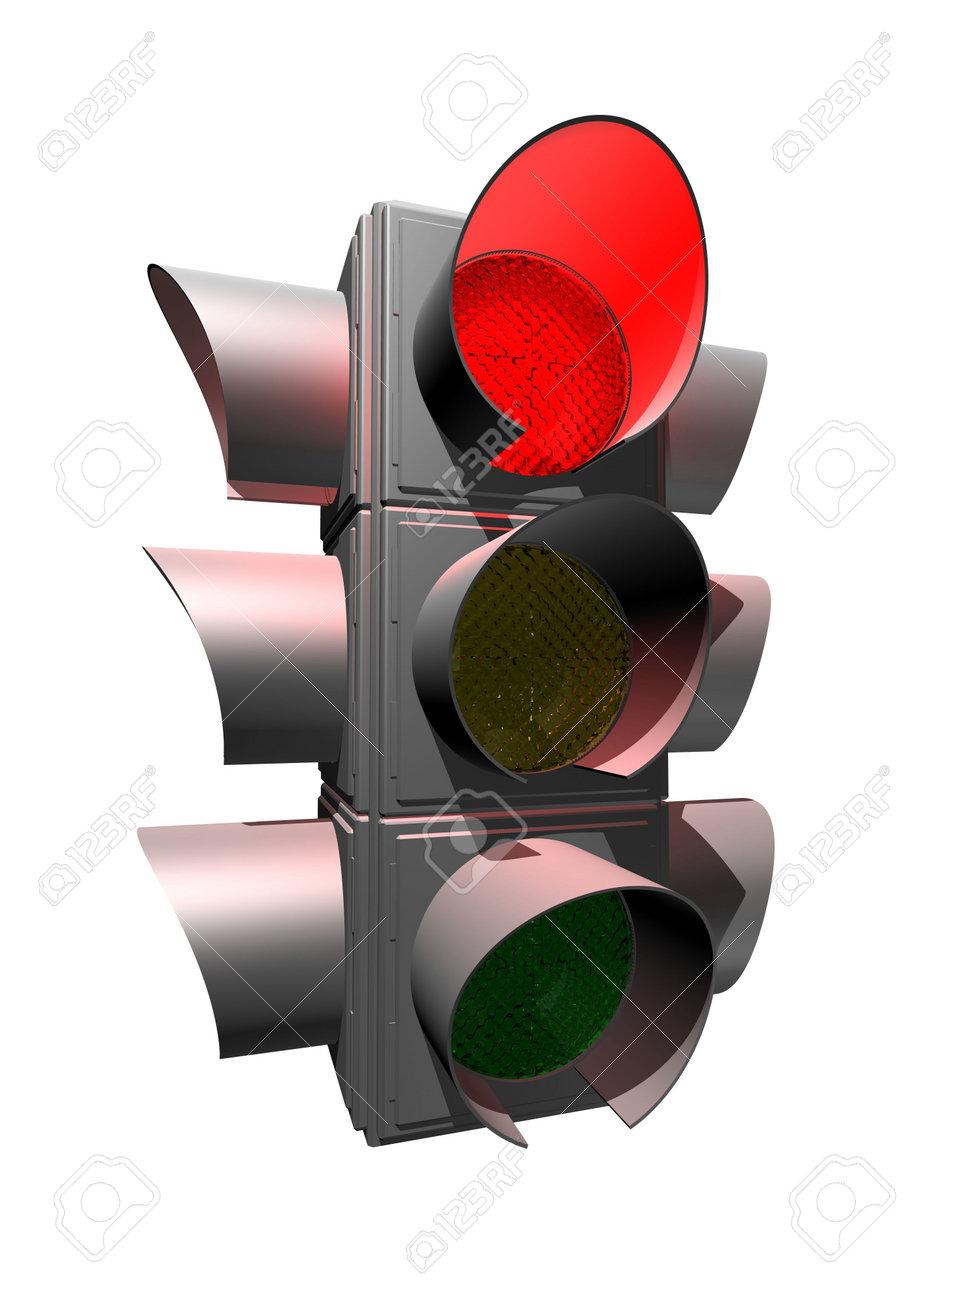 traffic light Stock Photo - 659854